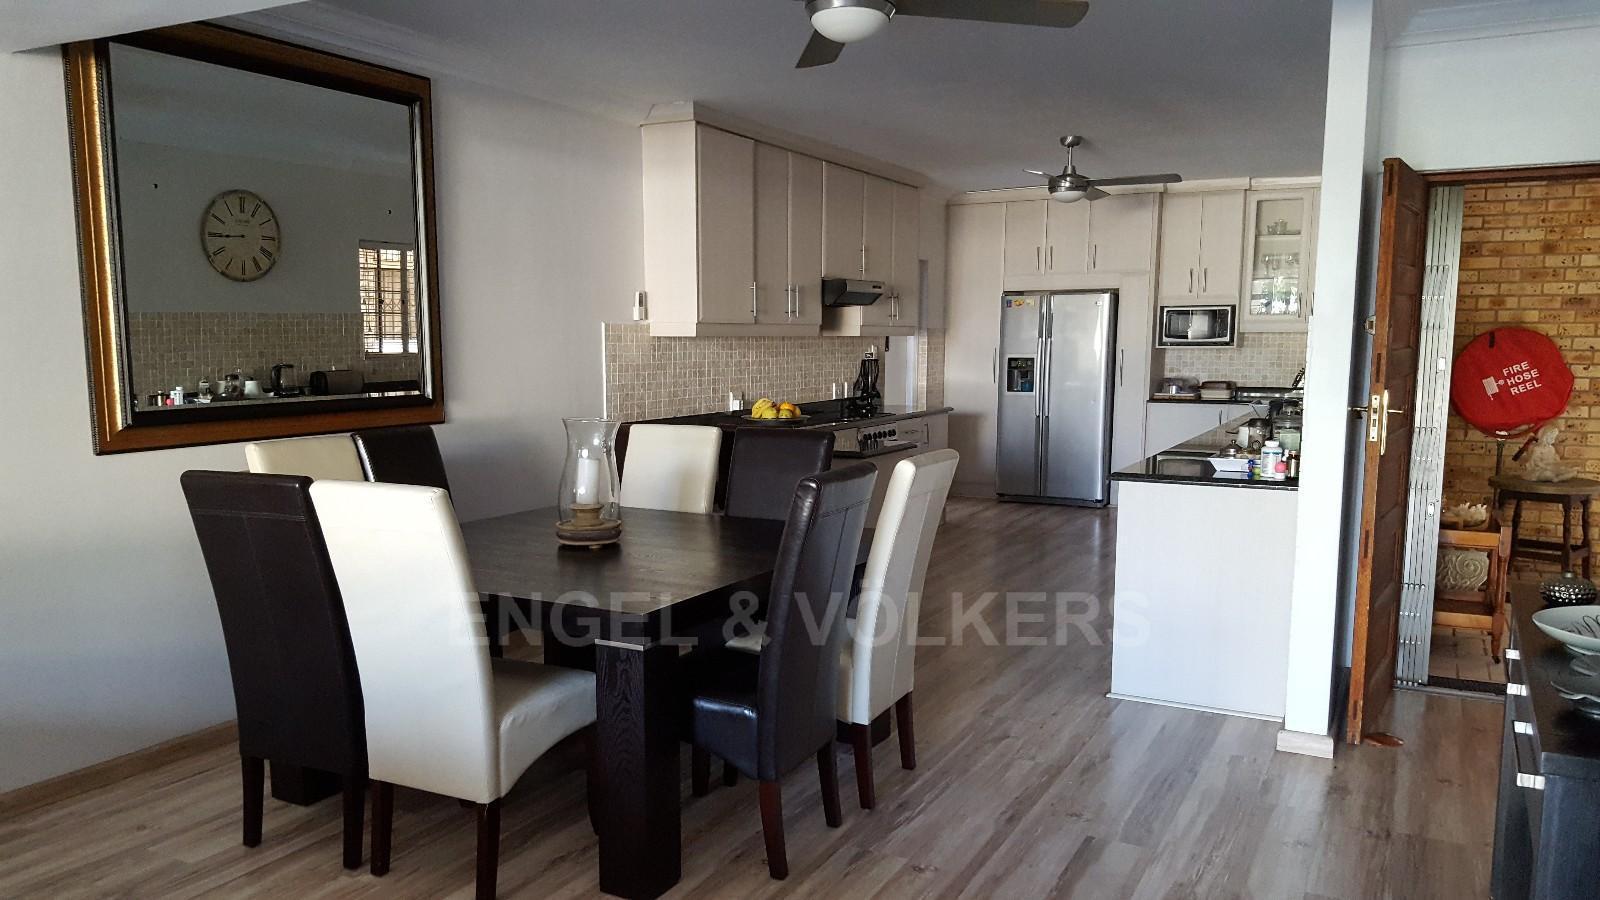 Umhlanga Rocks property for sale. Ref No: 13361380. Picture no 7